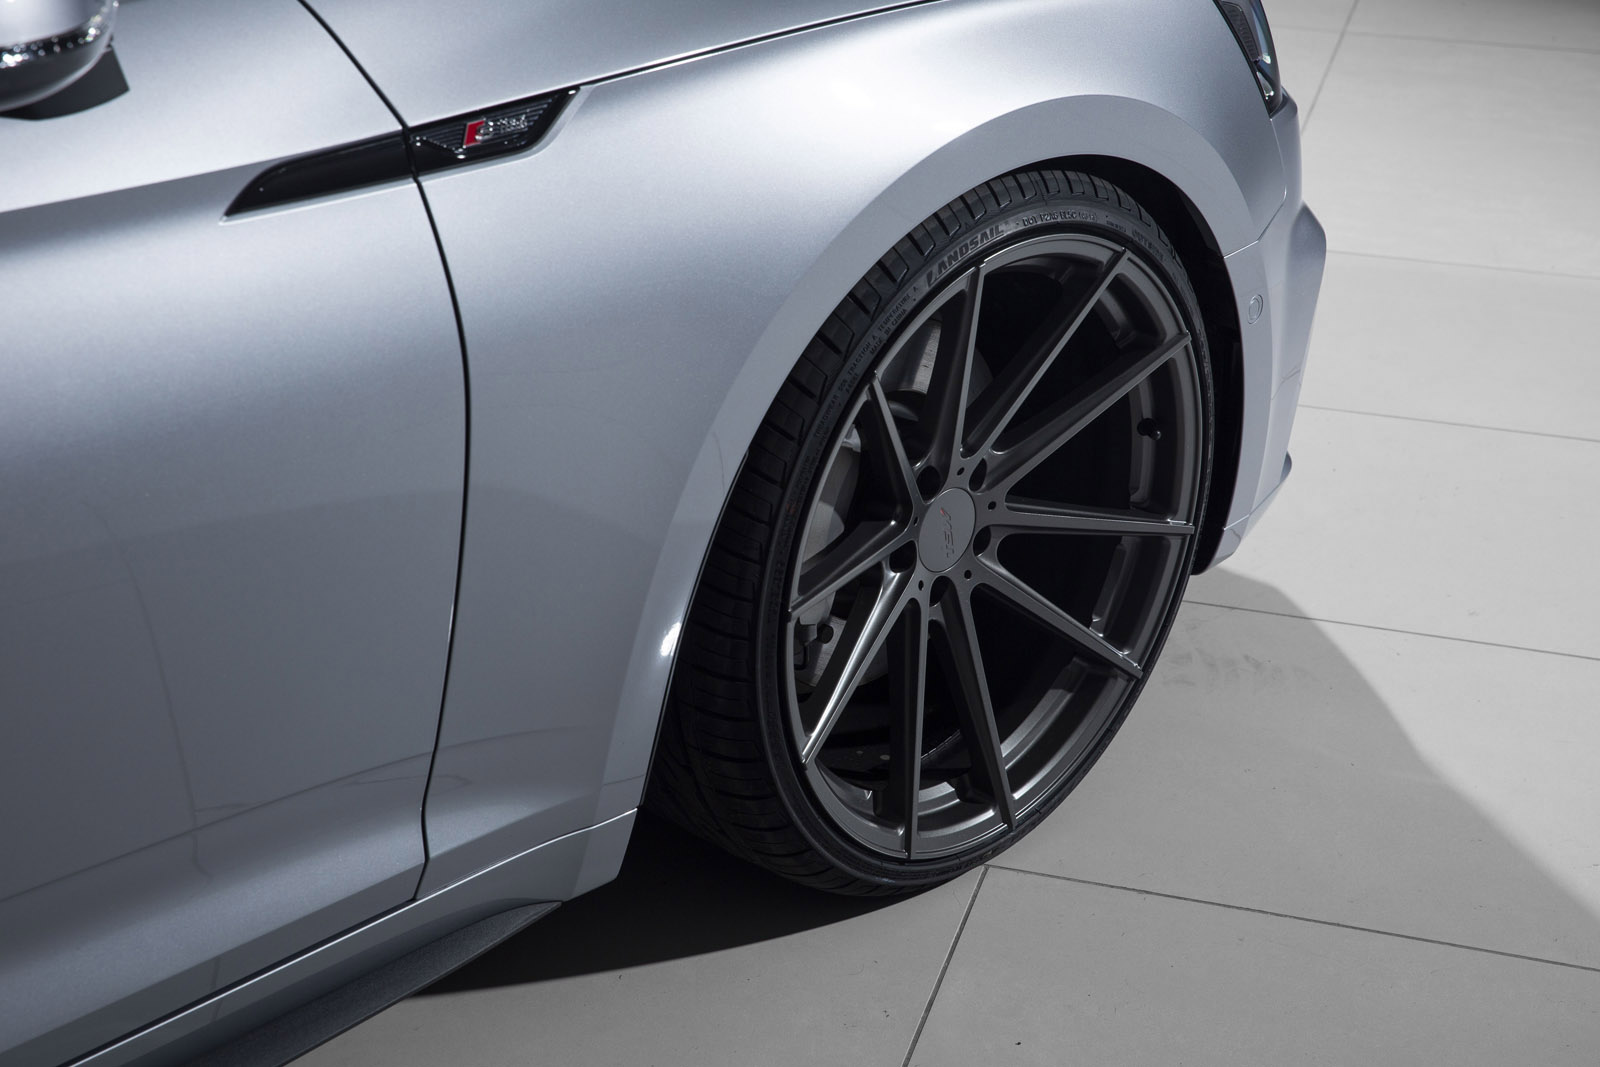 Audi_A5_05.jpg